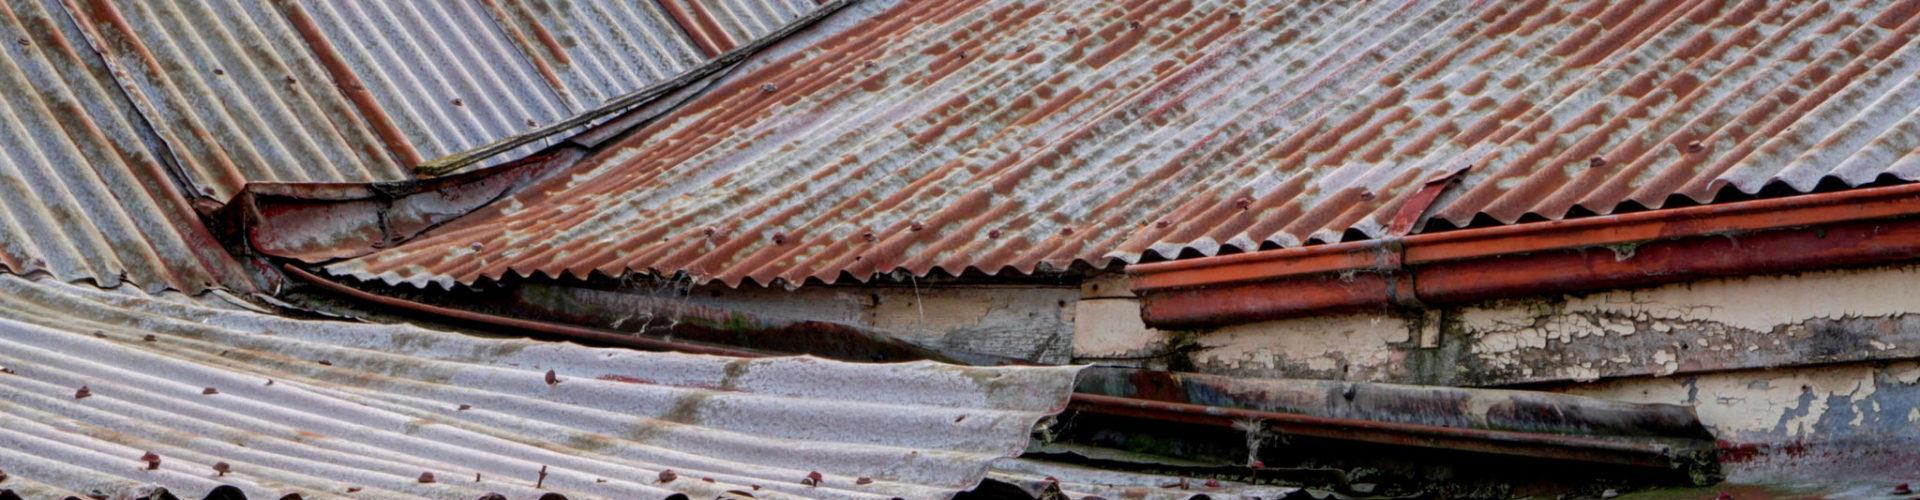 Poor roofing iron